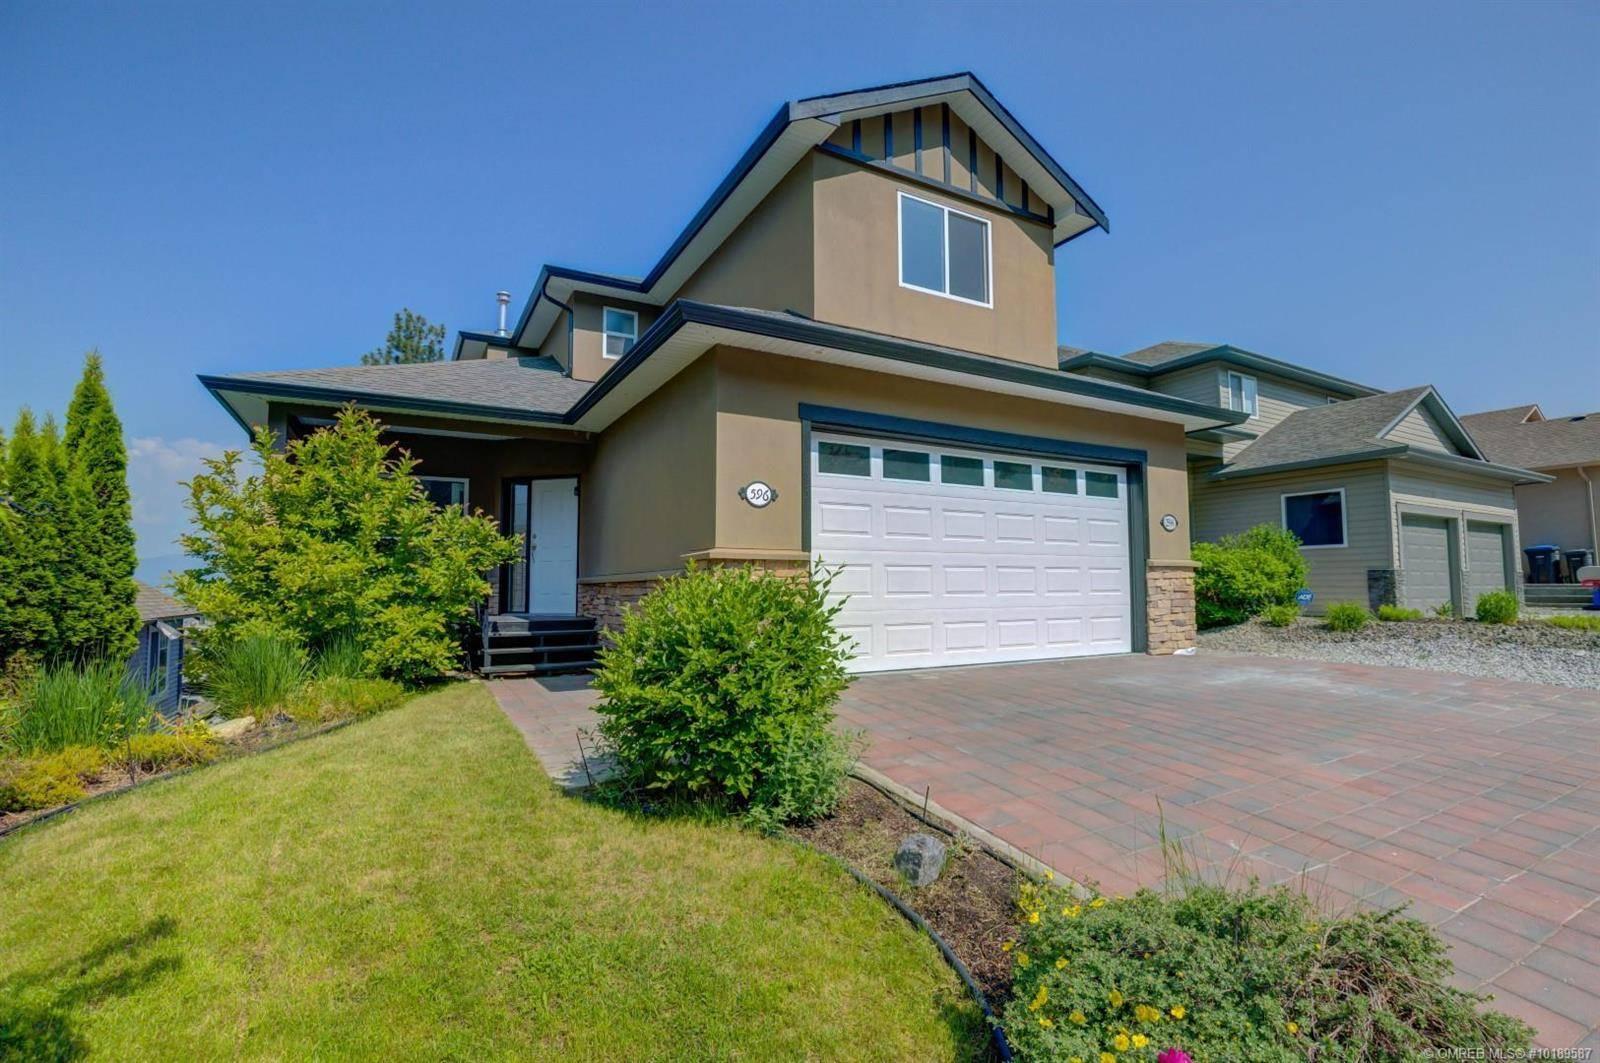 House for sale at 596 Arrowleaf Ln Kelowna British Columbia - MLS: 10189587